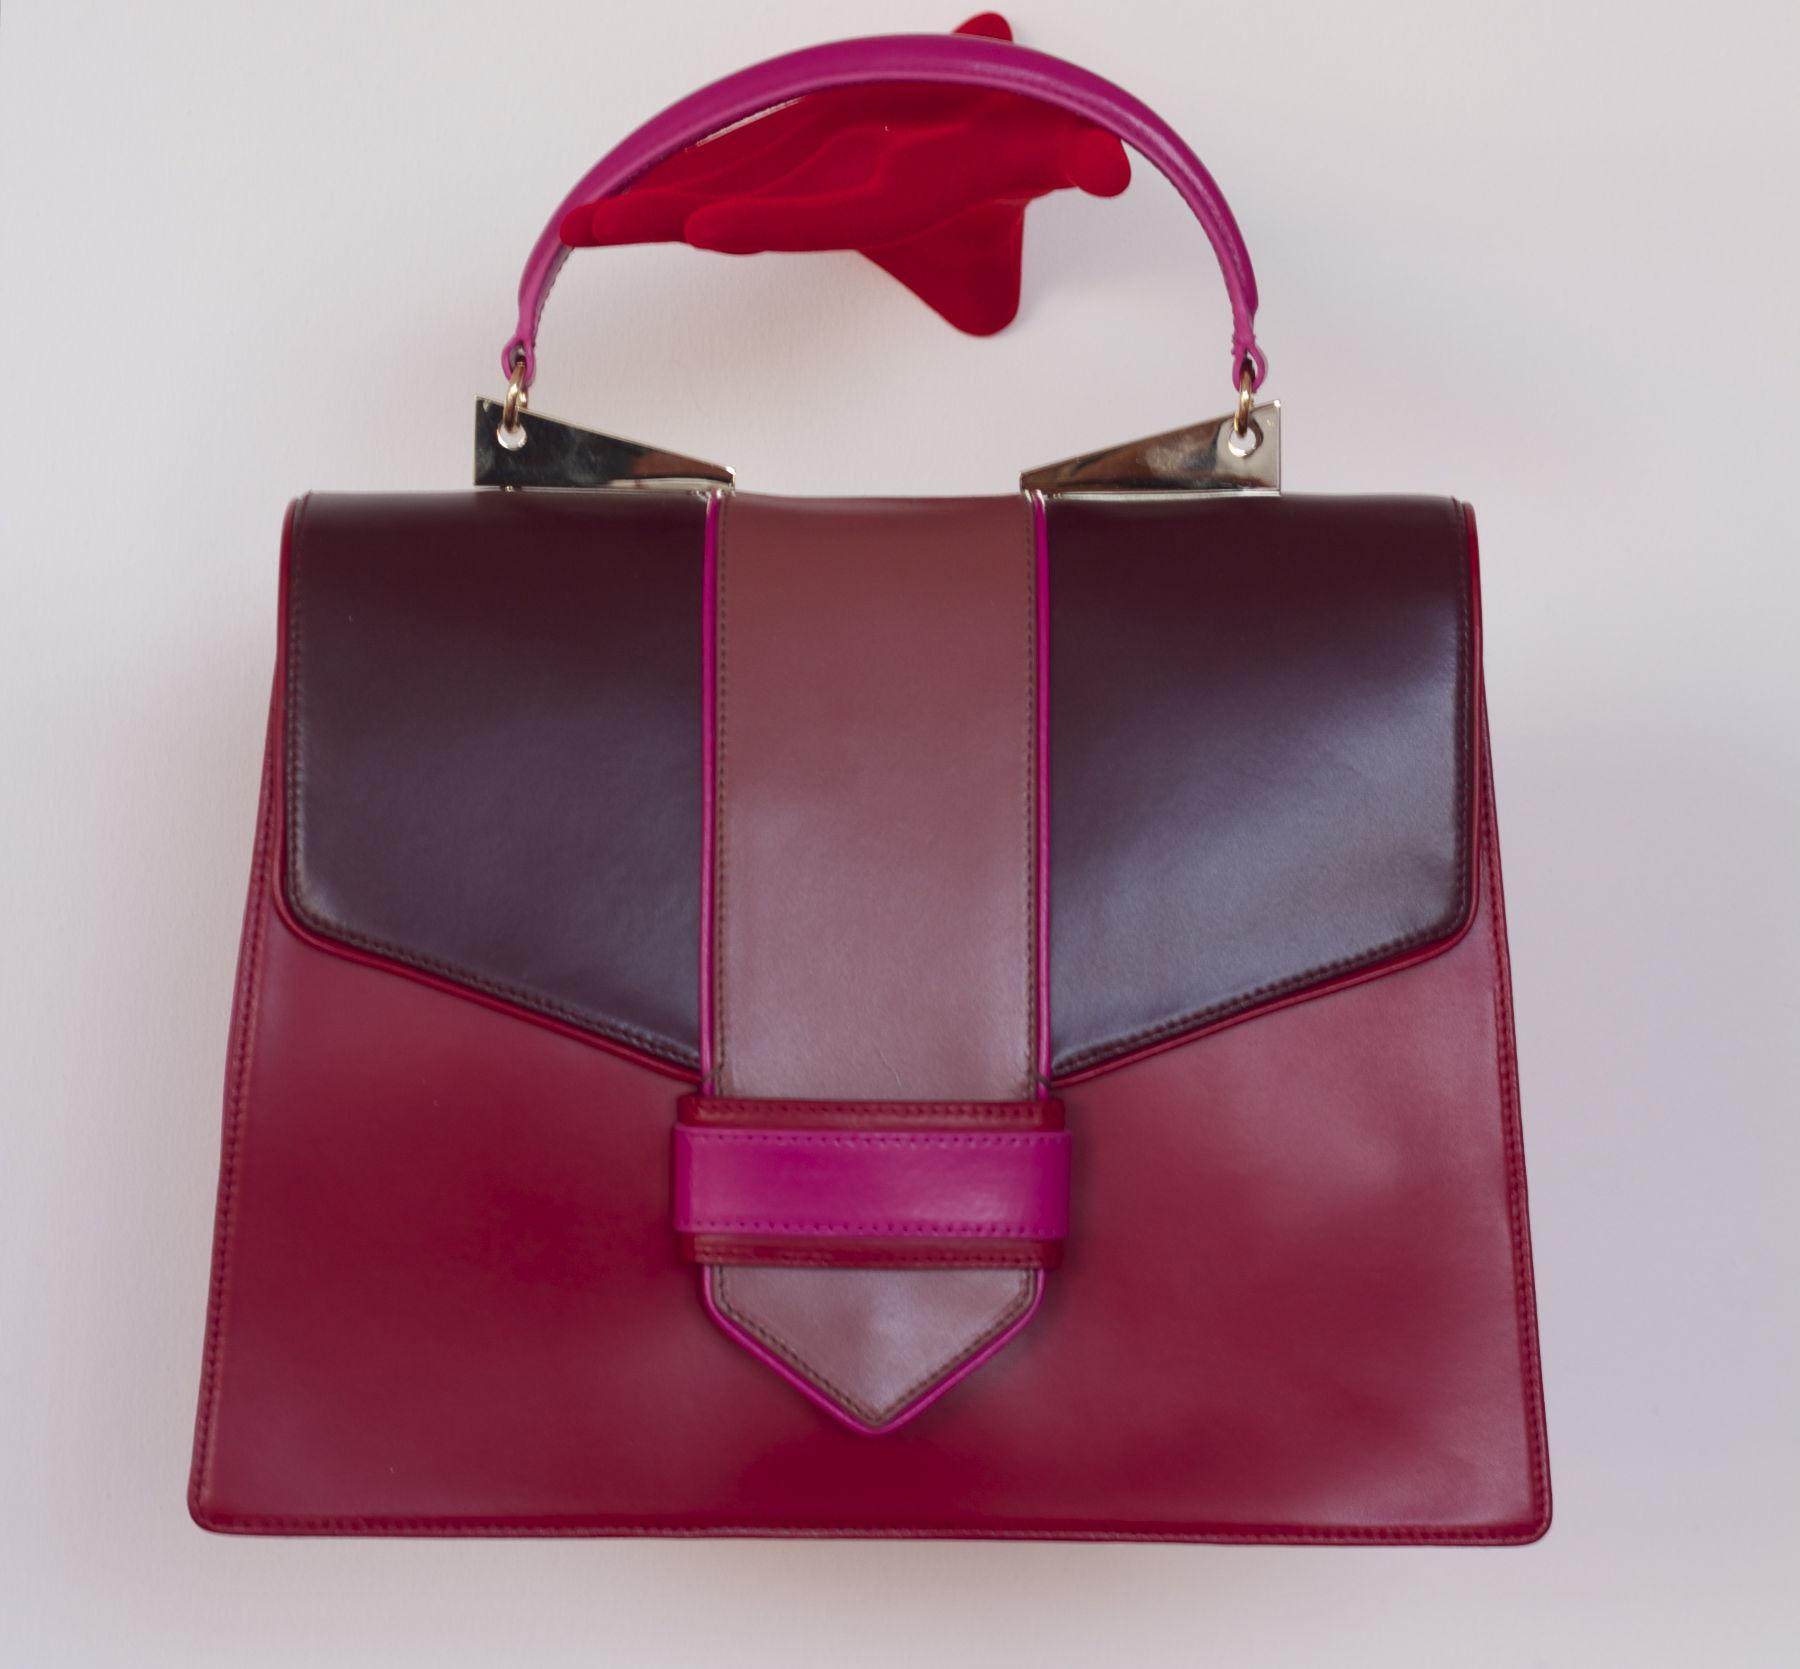 Handbag 2014 Fashion Sara Battaglia